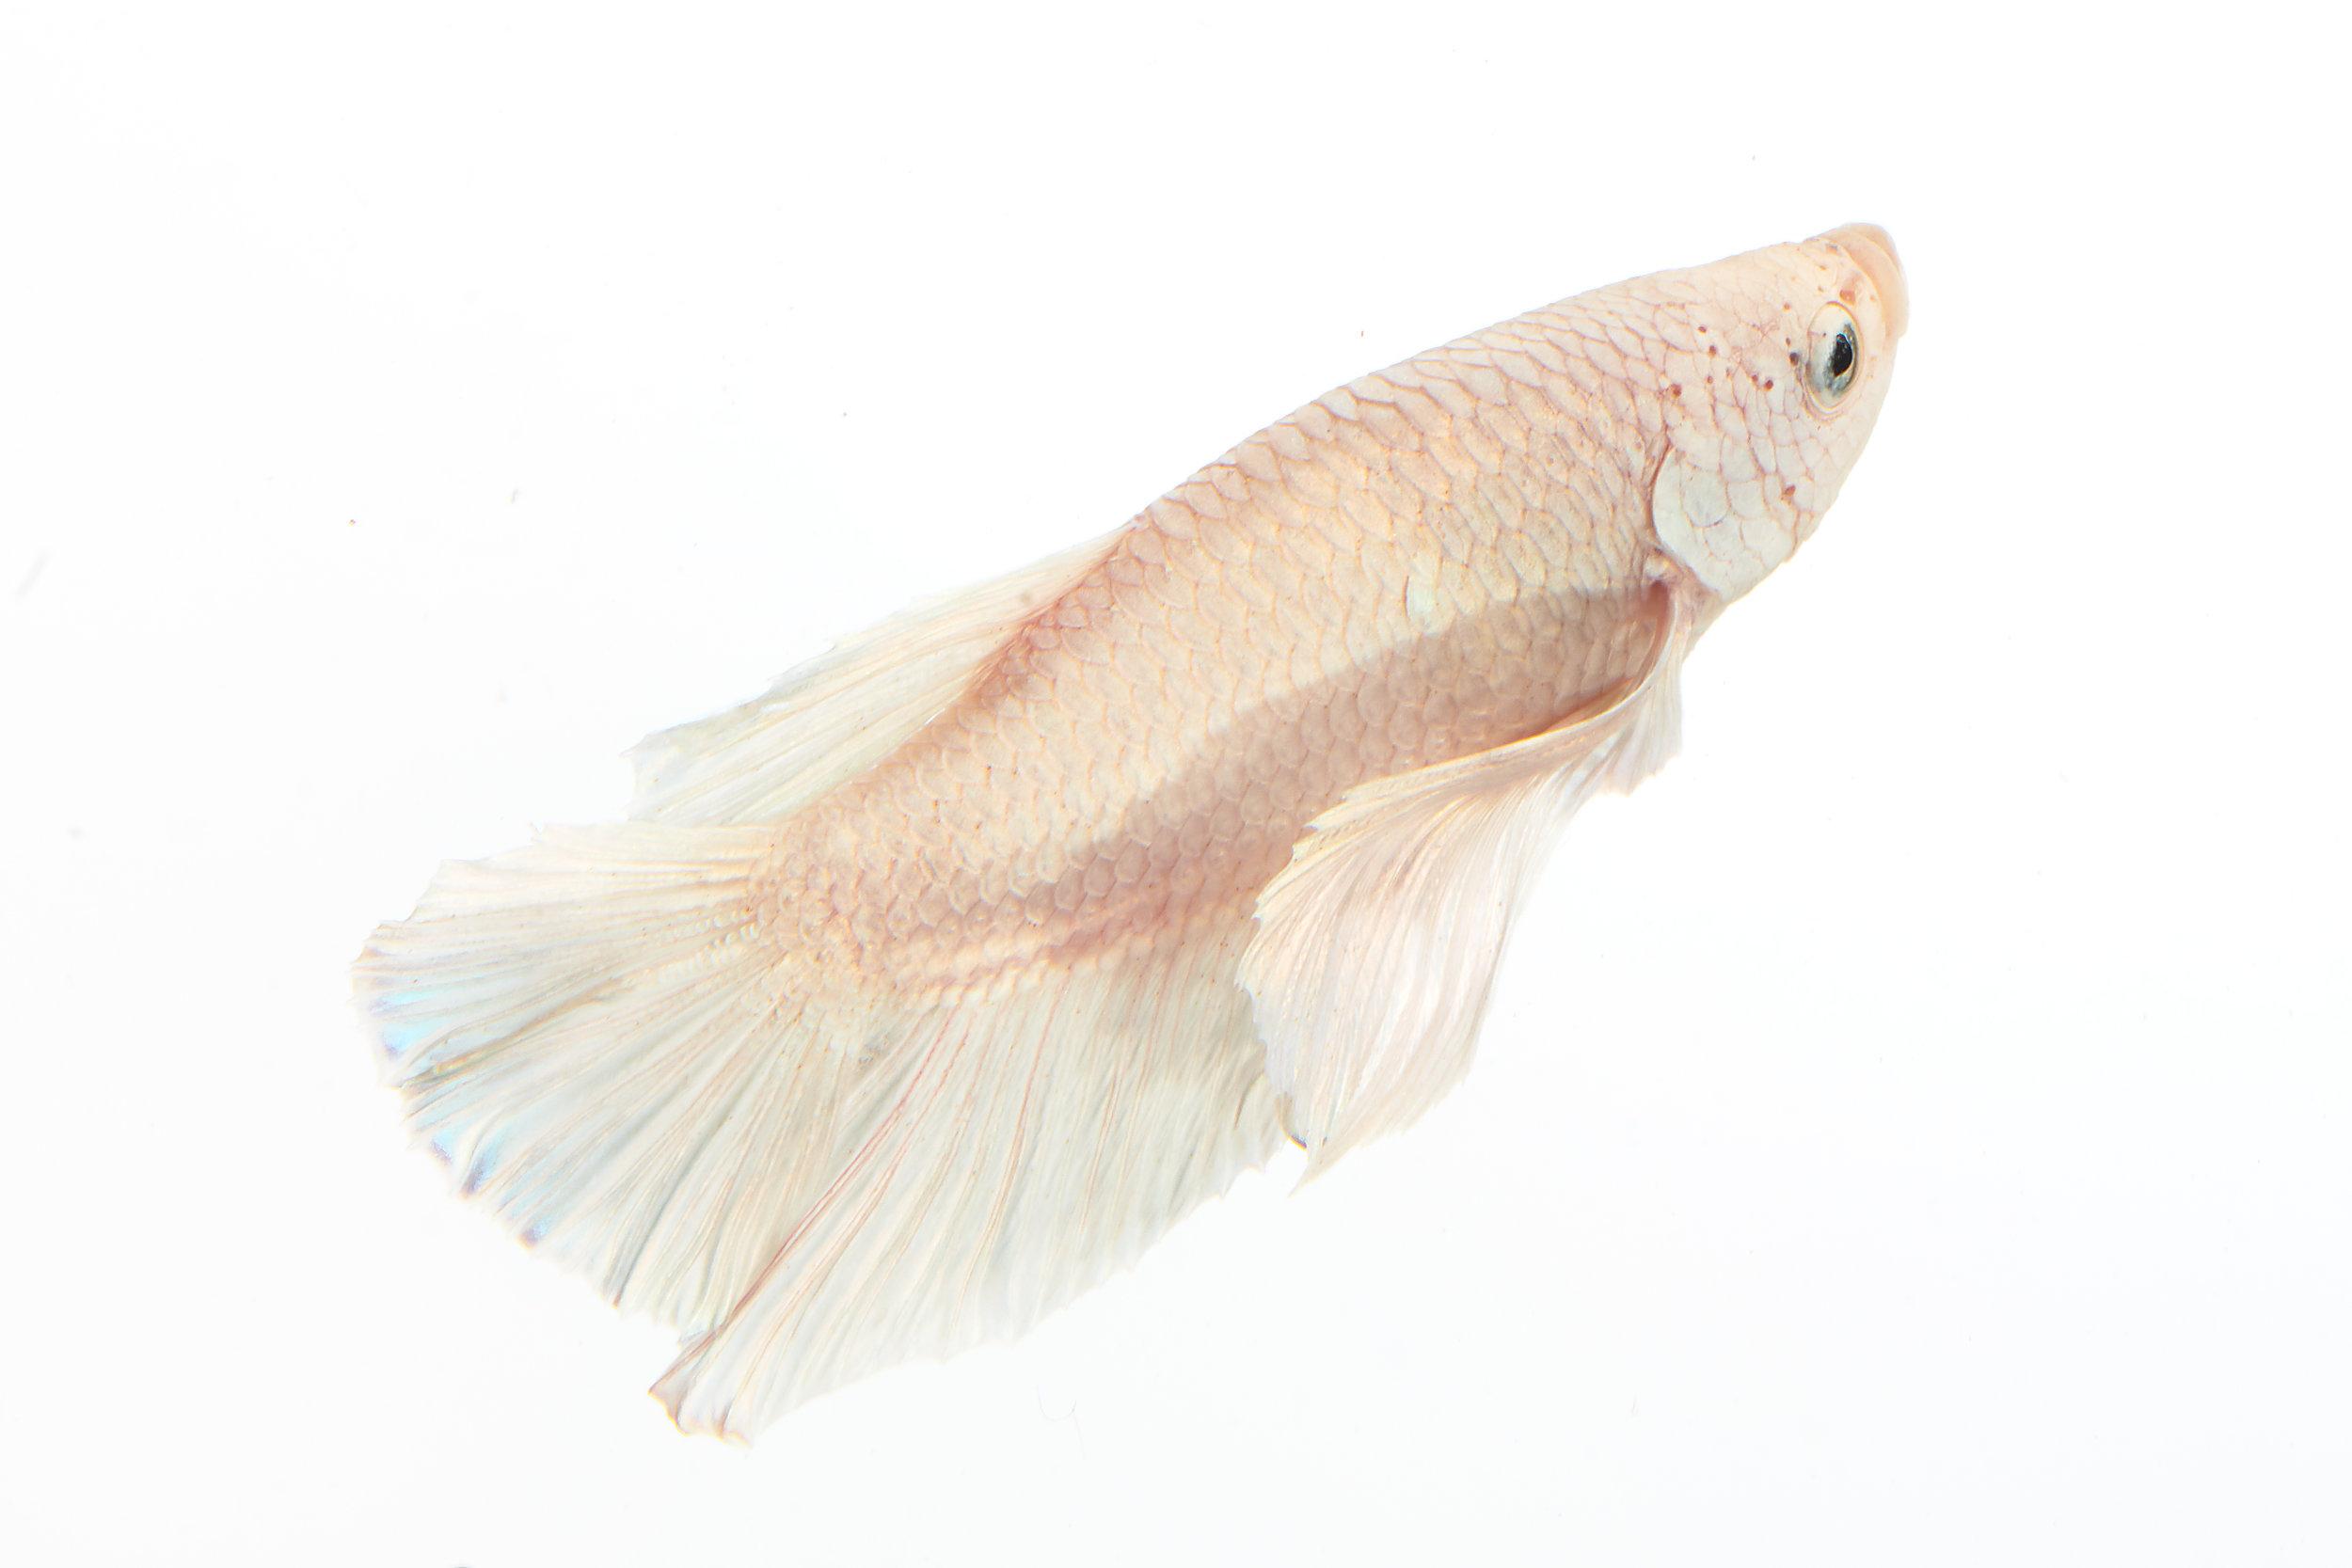 2019_Bettafish00087.jpg